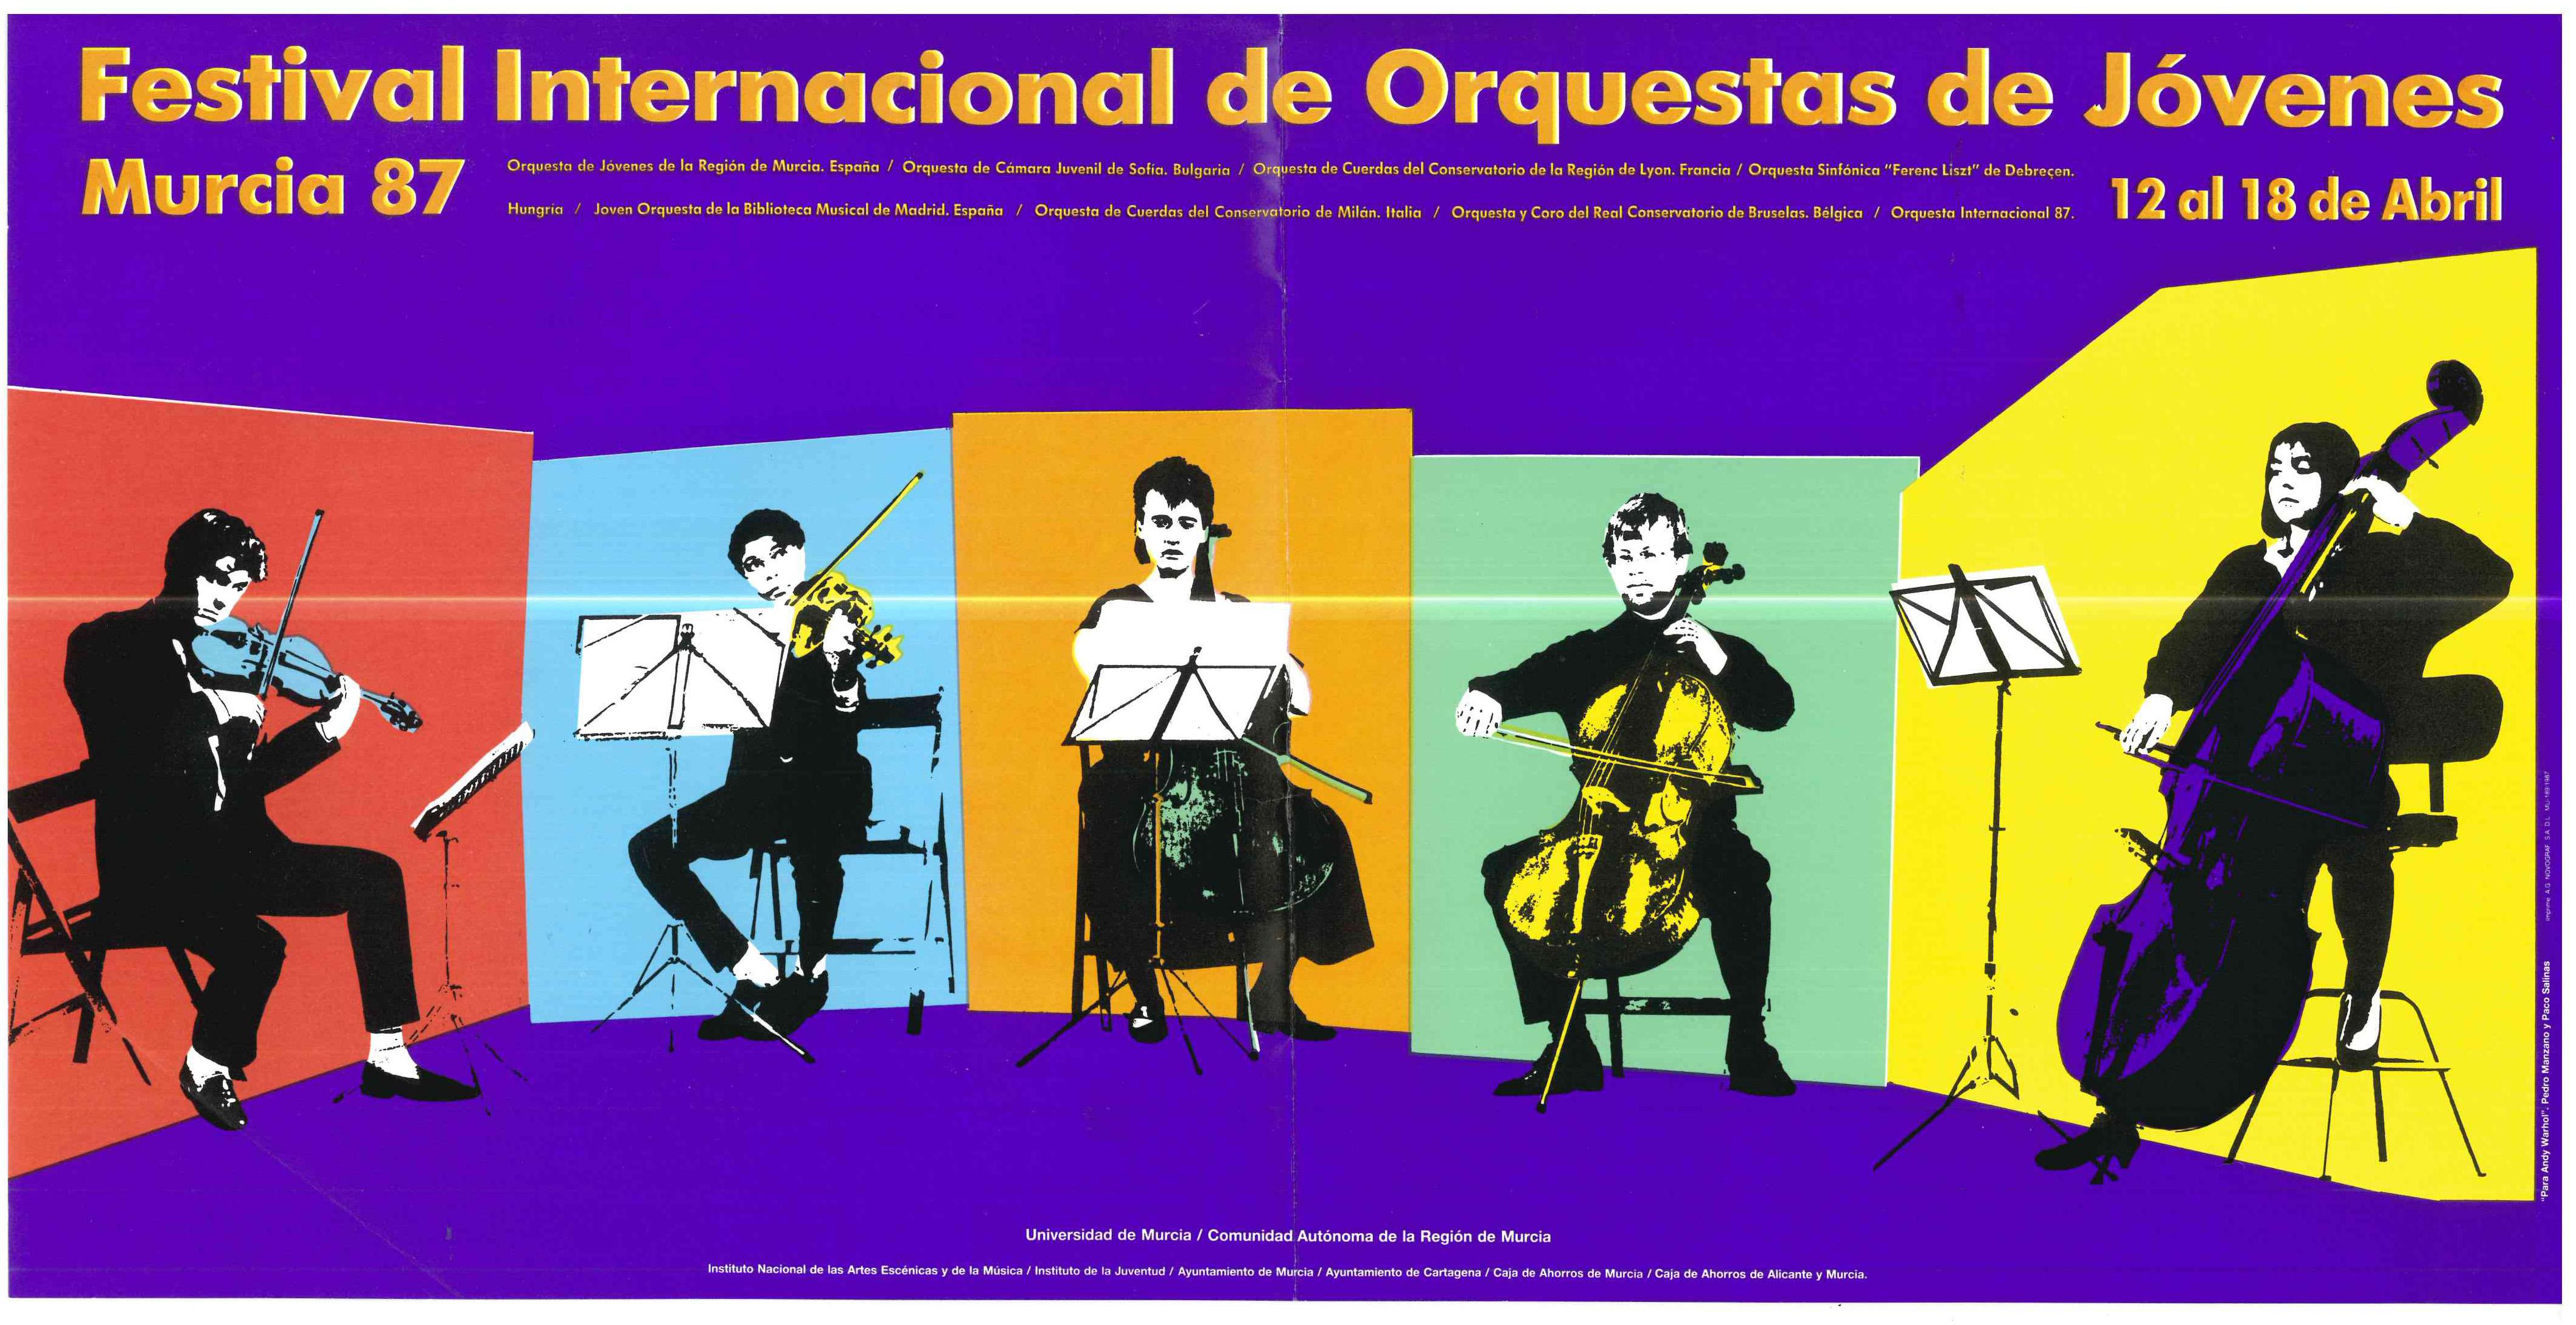 00183-Festival iernacional de Orquestas de Jovenes Murcia, 12-18th April 1987.jp